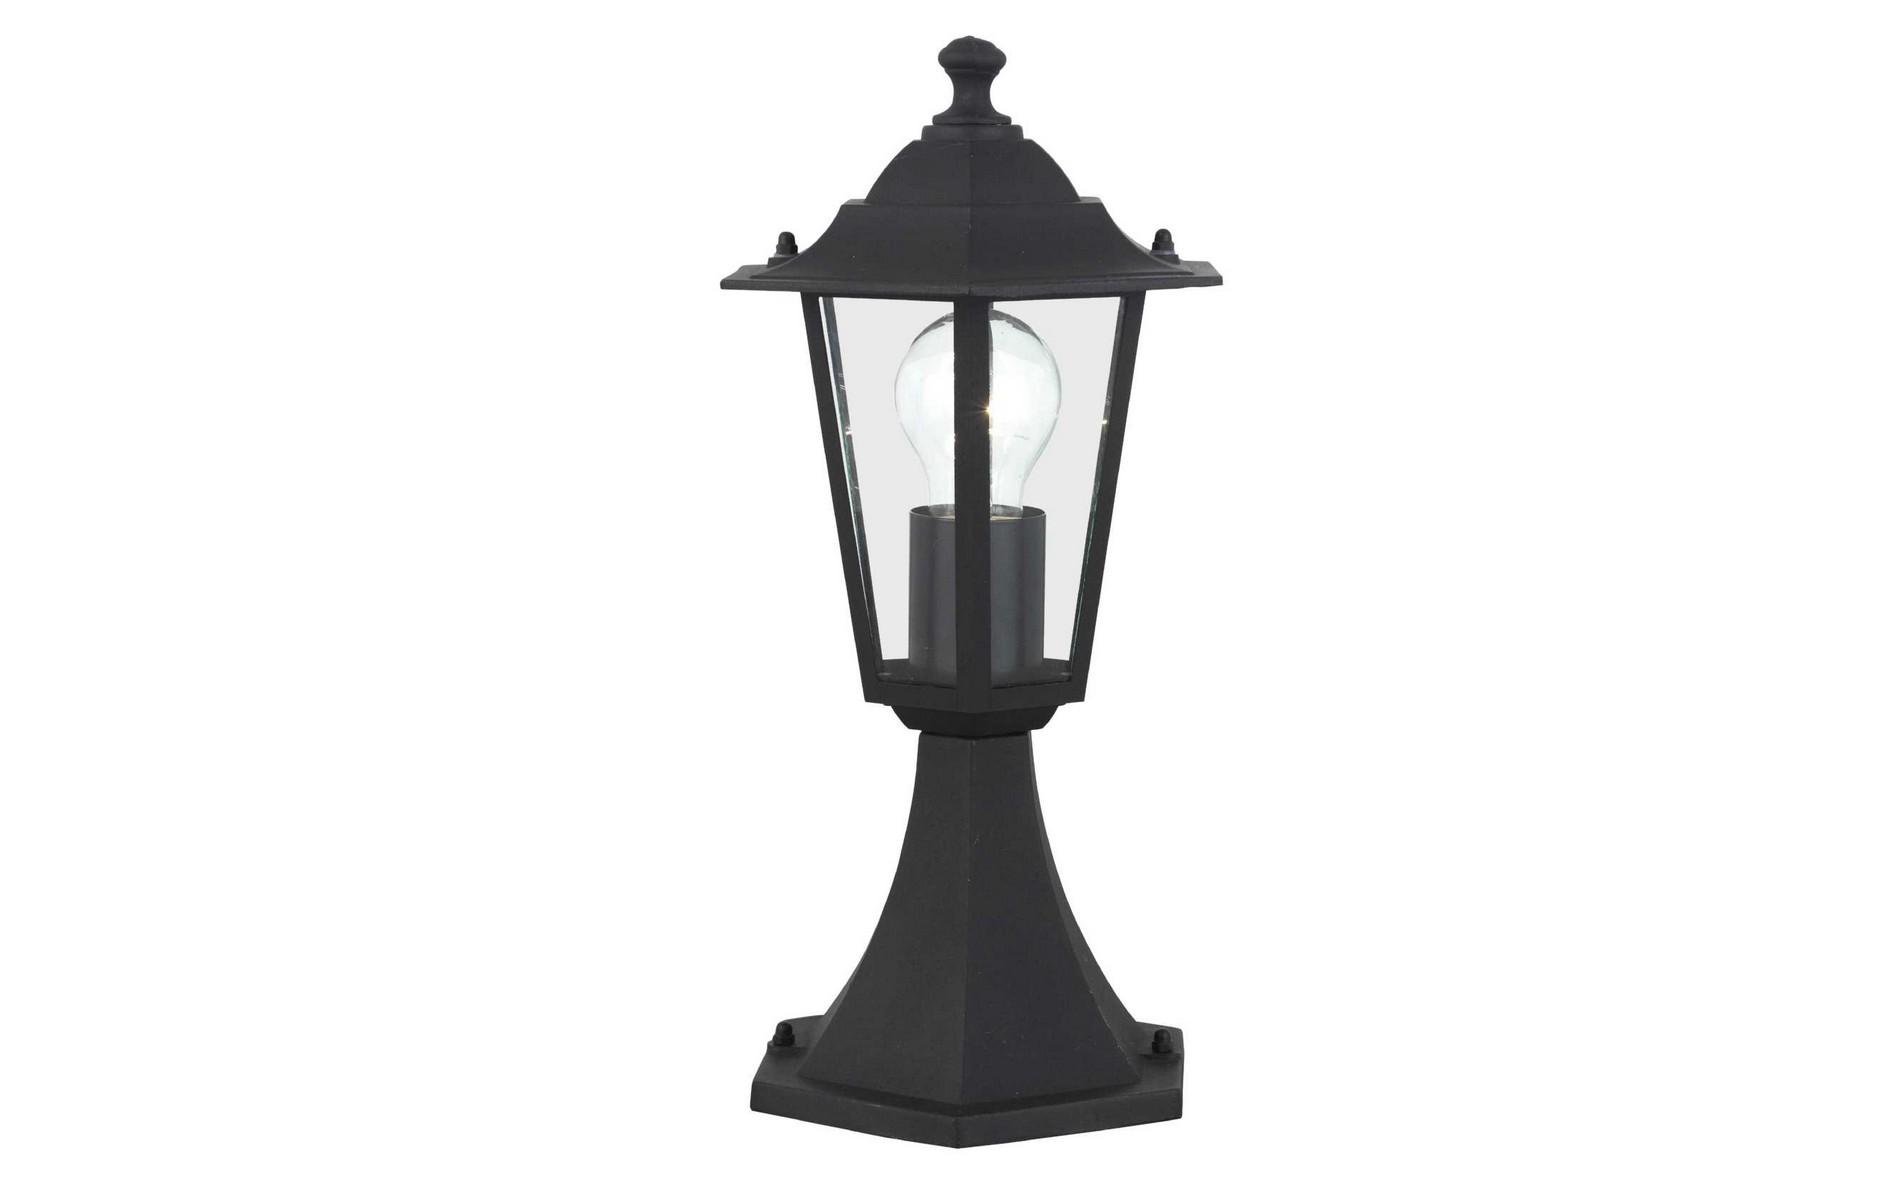 Светильник уличный CROWNУличные наземные светильники<br>&amp;lt;div&amp;gt;Вид цоколя: Е27&amp;lt;/div&amp;gt;&amp;lt;div&amp;gt;Мощность лампы: 60W&amp;lt;/div&amp;gt;&amp;lt;div&amp;gt;Количество ламп: 1&amp;lt;/div&amp;gt;&amp;lt;div&amp;gt;Наличие ламп: нет&amp;lt;/div&amp;gt;<br><br>Material: Металл<br>Height см: 37<br>Diameter см: 16,5